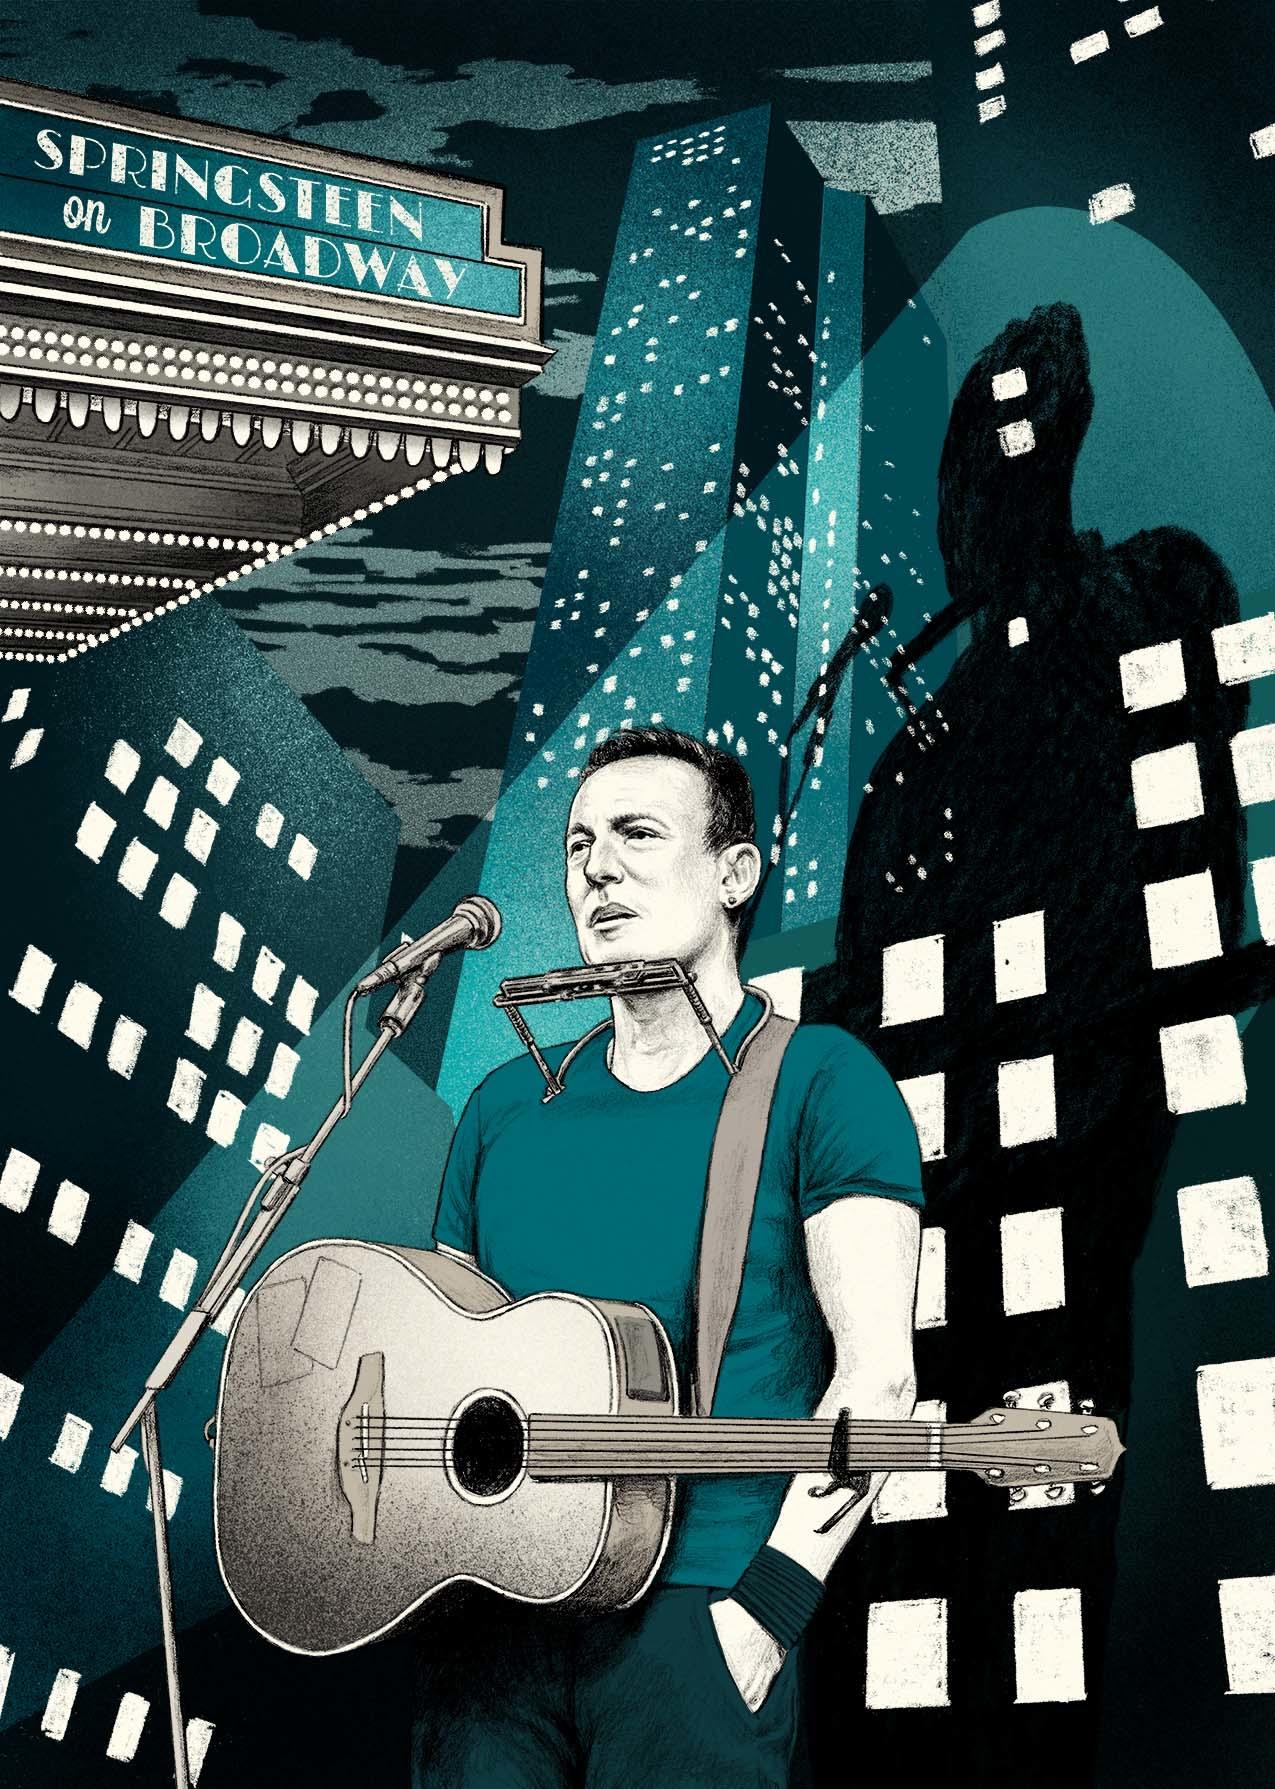 Springsteen-on-Broadway Artwork-mojo-Jennifer Dionisio.jpg